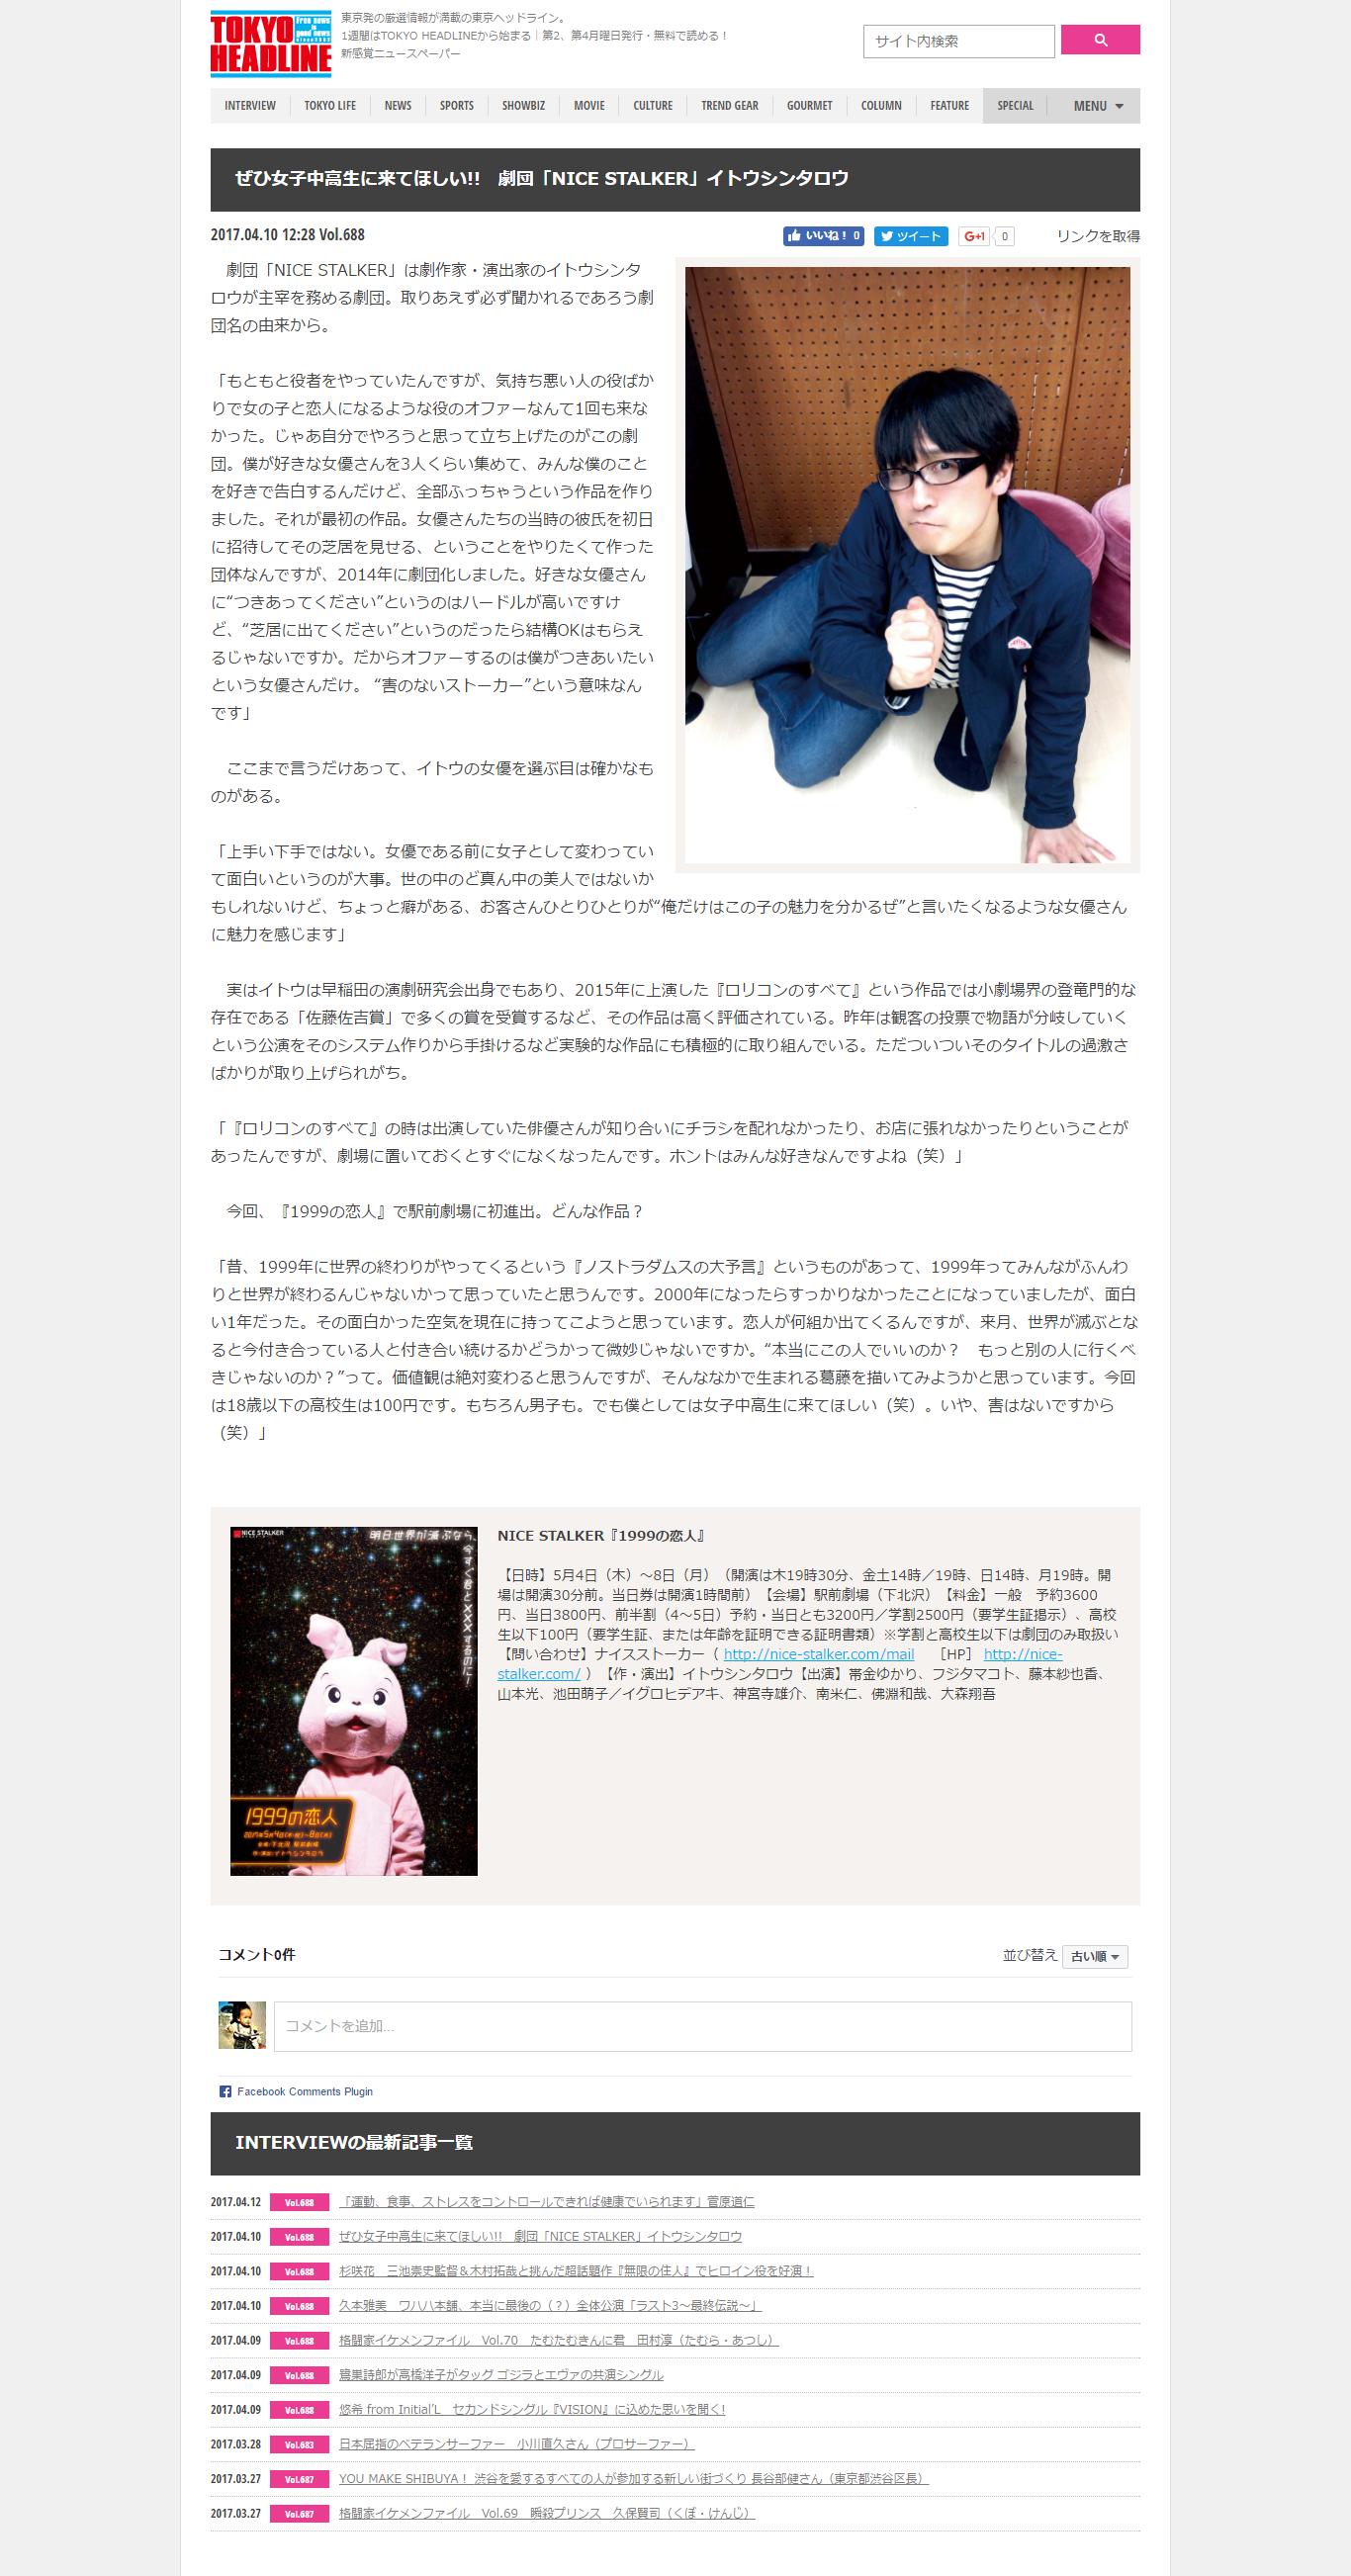 FireShot Capture 4 - ぜひ女子中高生に来てほしい!! 劇団「NICE STALKER」イトウシンタ_ - http___www.tokyoheadline.com_